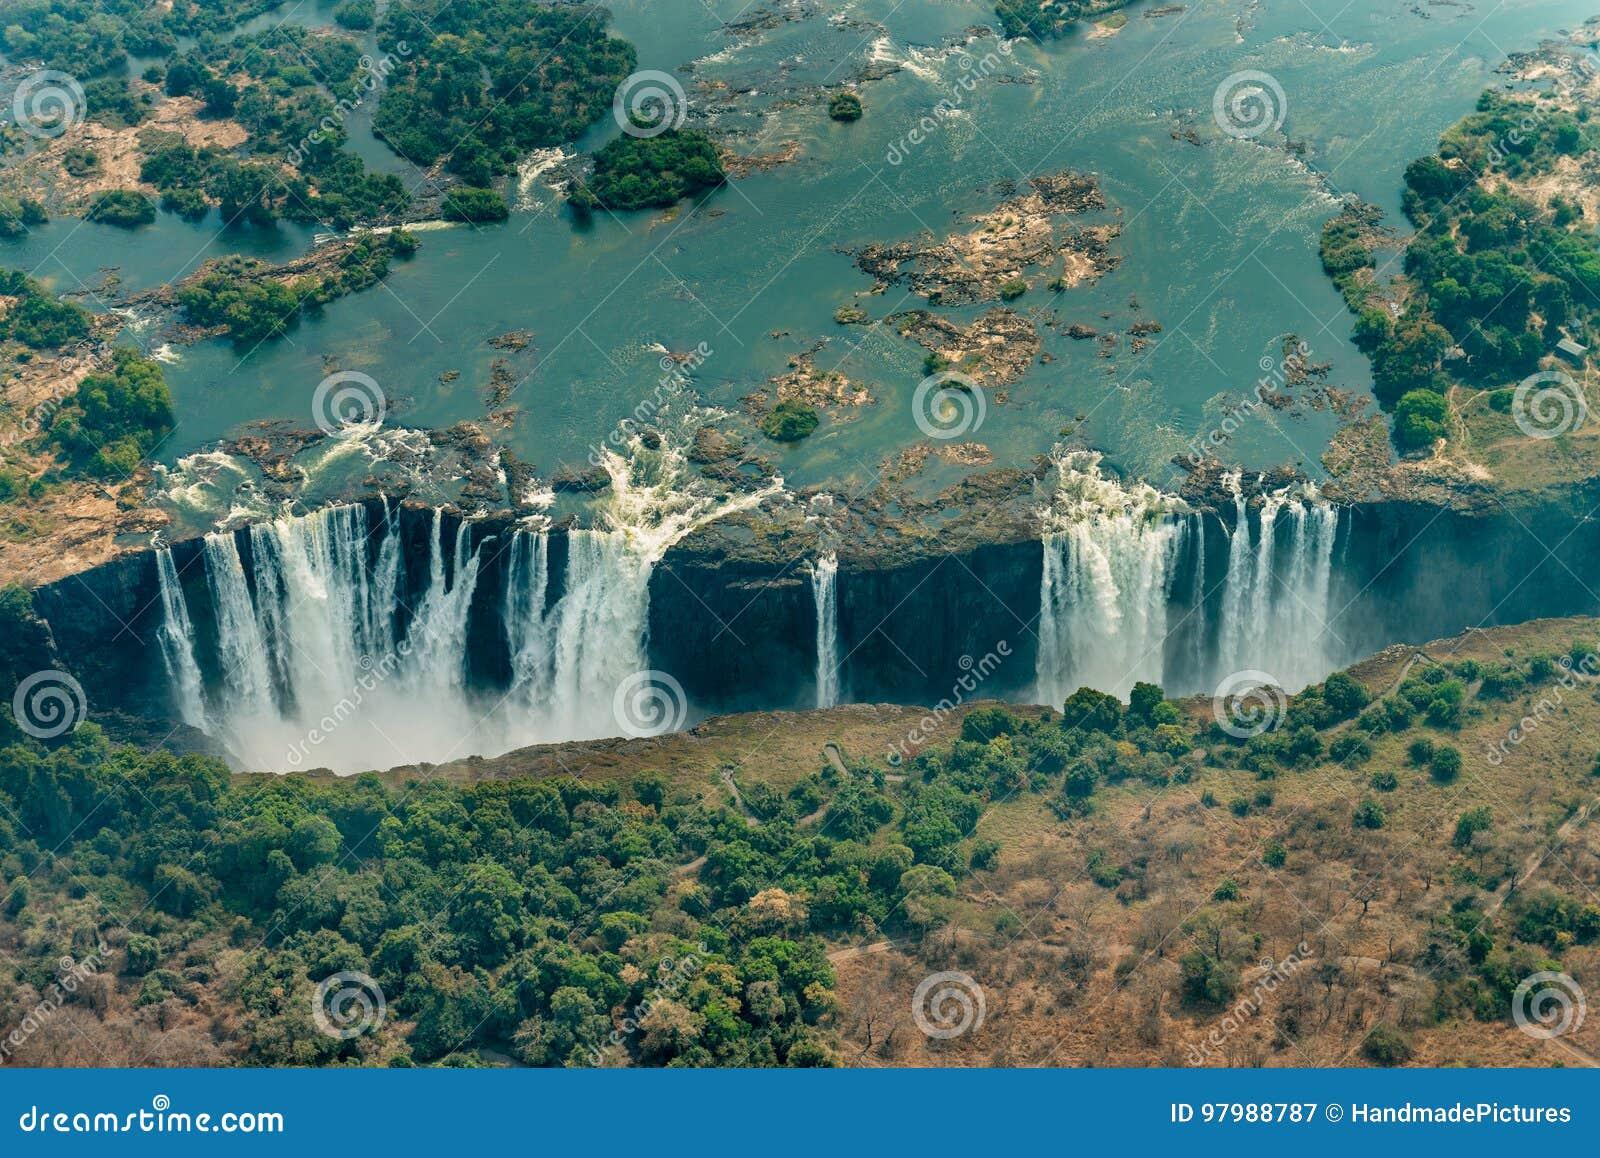 Victoria Falls em Zimbabwe na seca, tiro aéreo